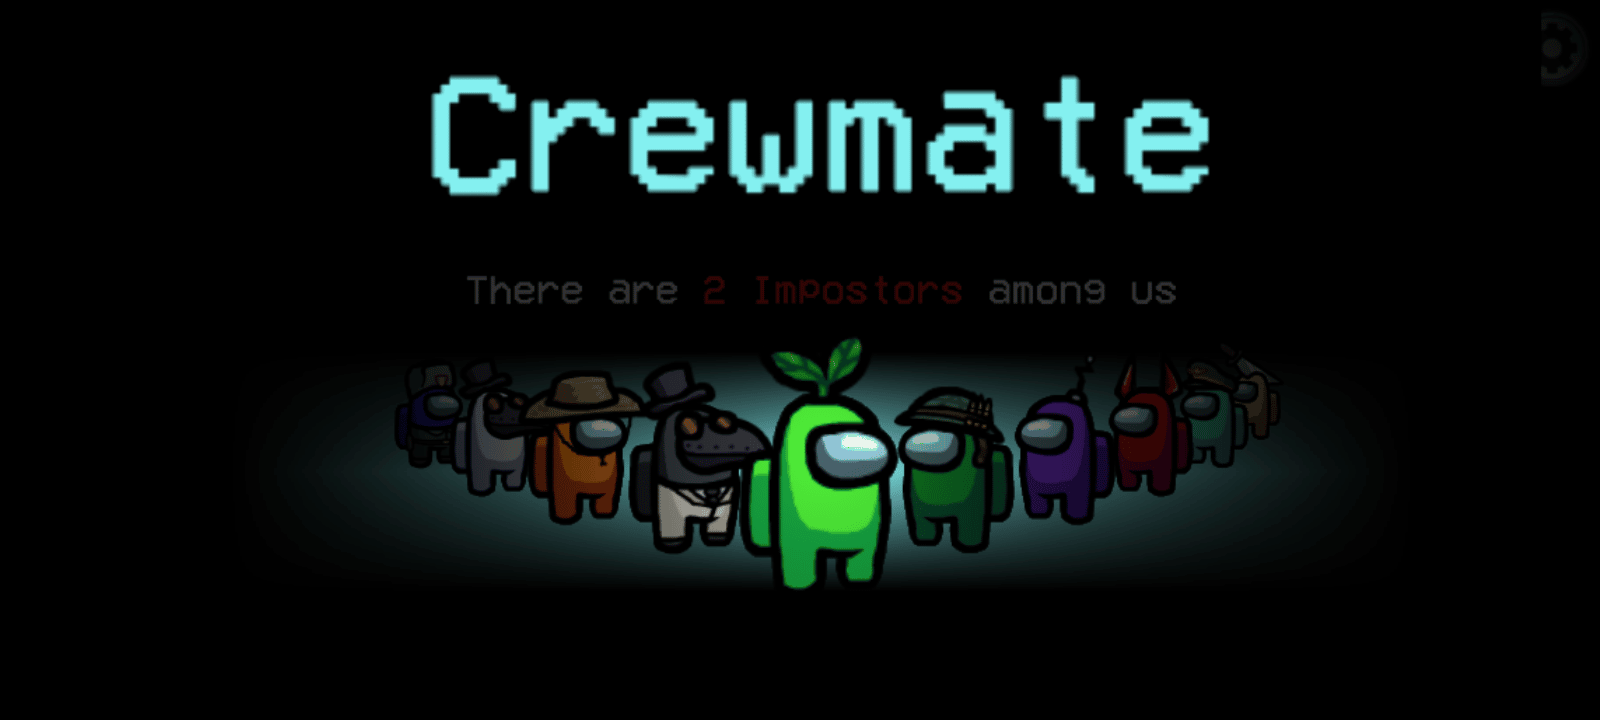 CrewMate Moto E7 Plus